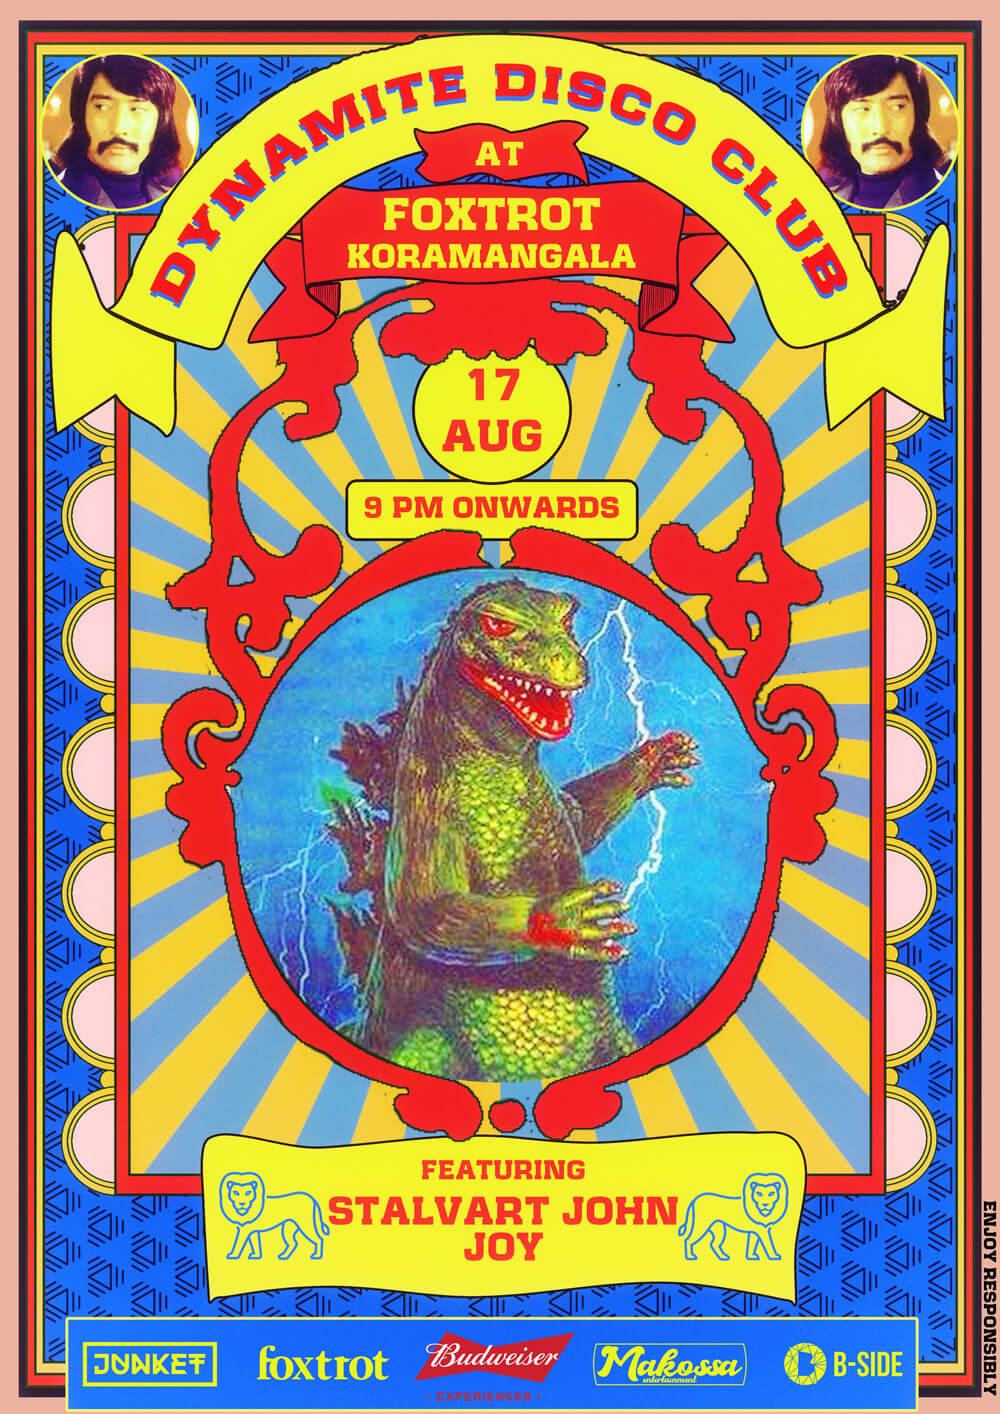 Dynamite Disco Club - Koramangala